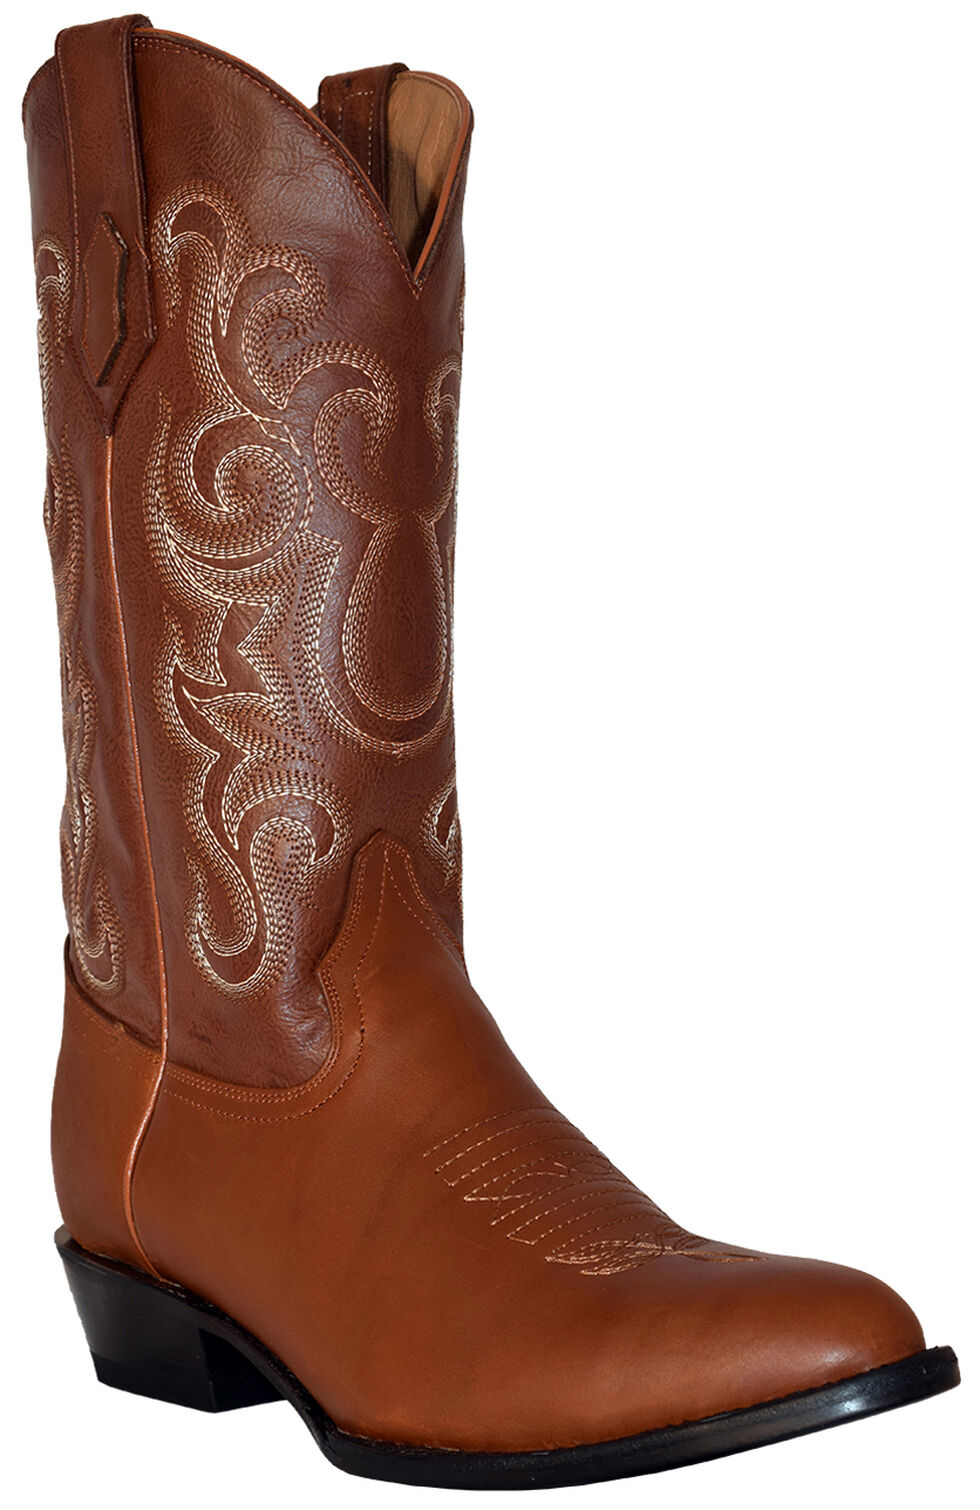 Ferrini Men's French Calf Leather Cowboy Boots - Round Toe, Cognac, hi-res